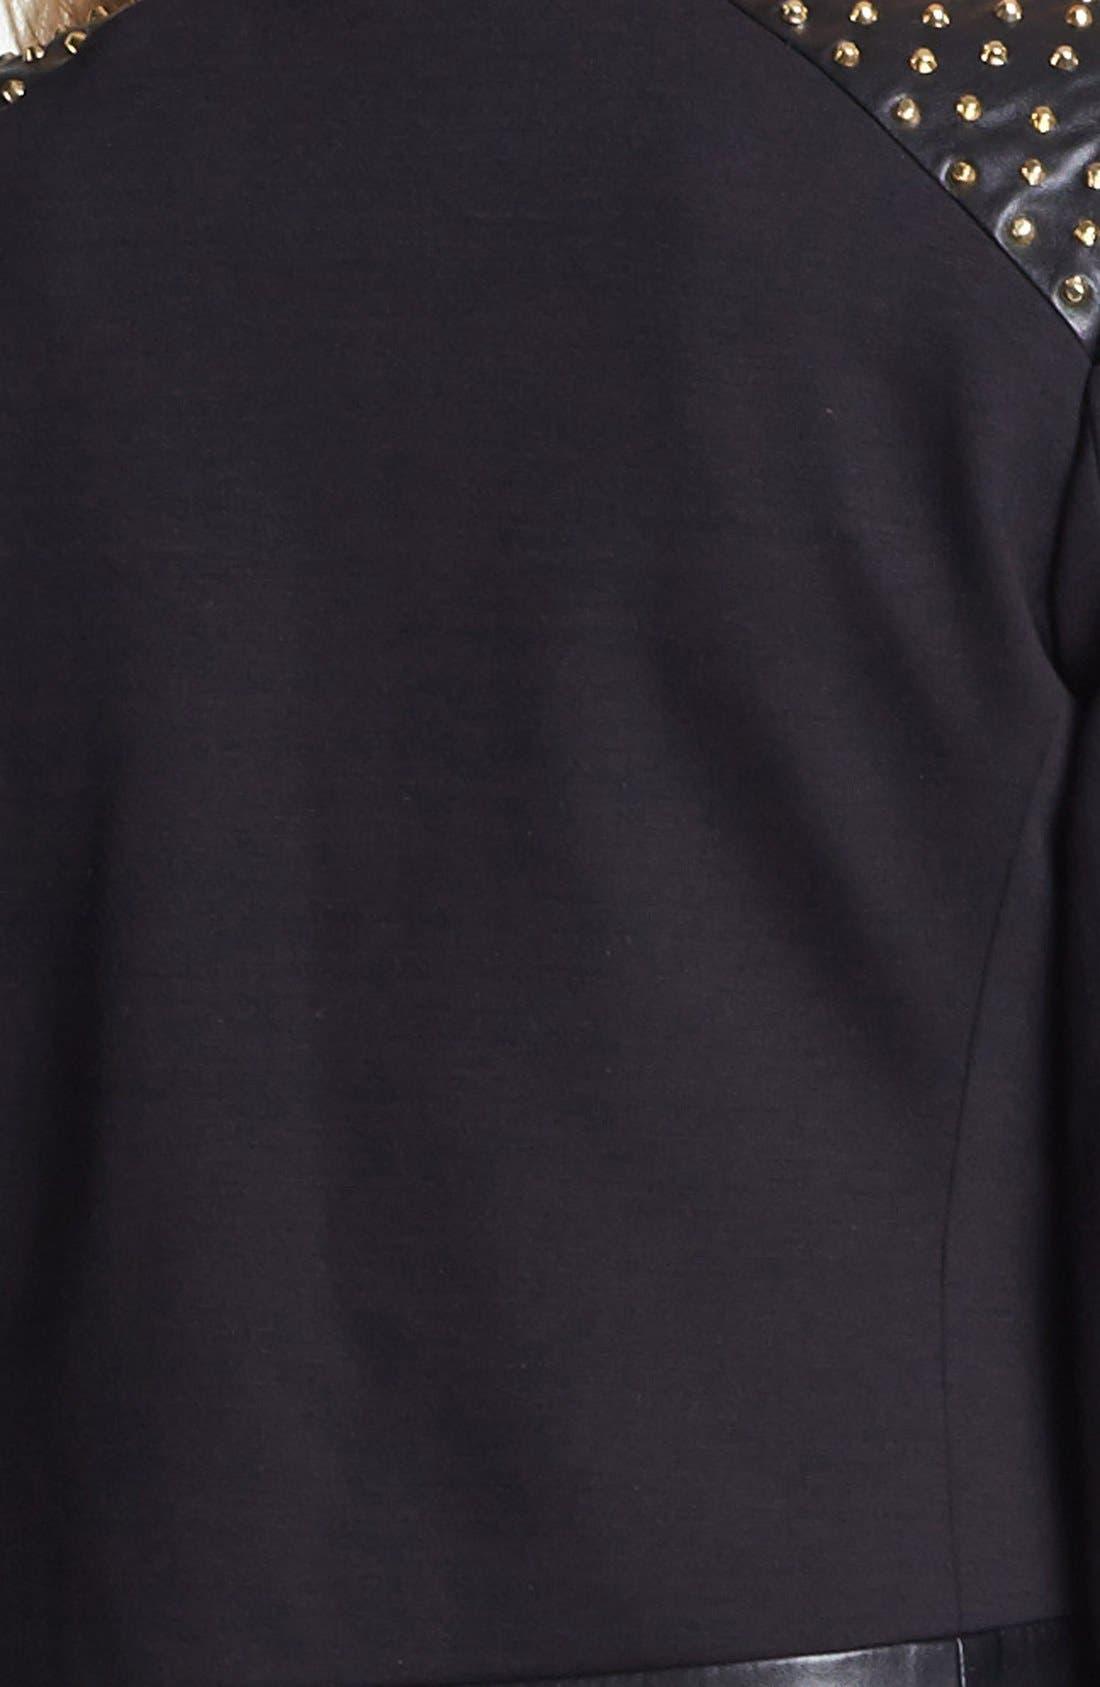 Alternate Image 3  - Vince Camuto Studded Faux Leather Trim Jacket